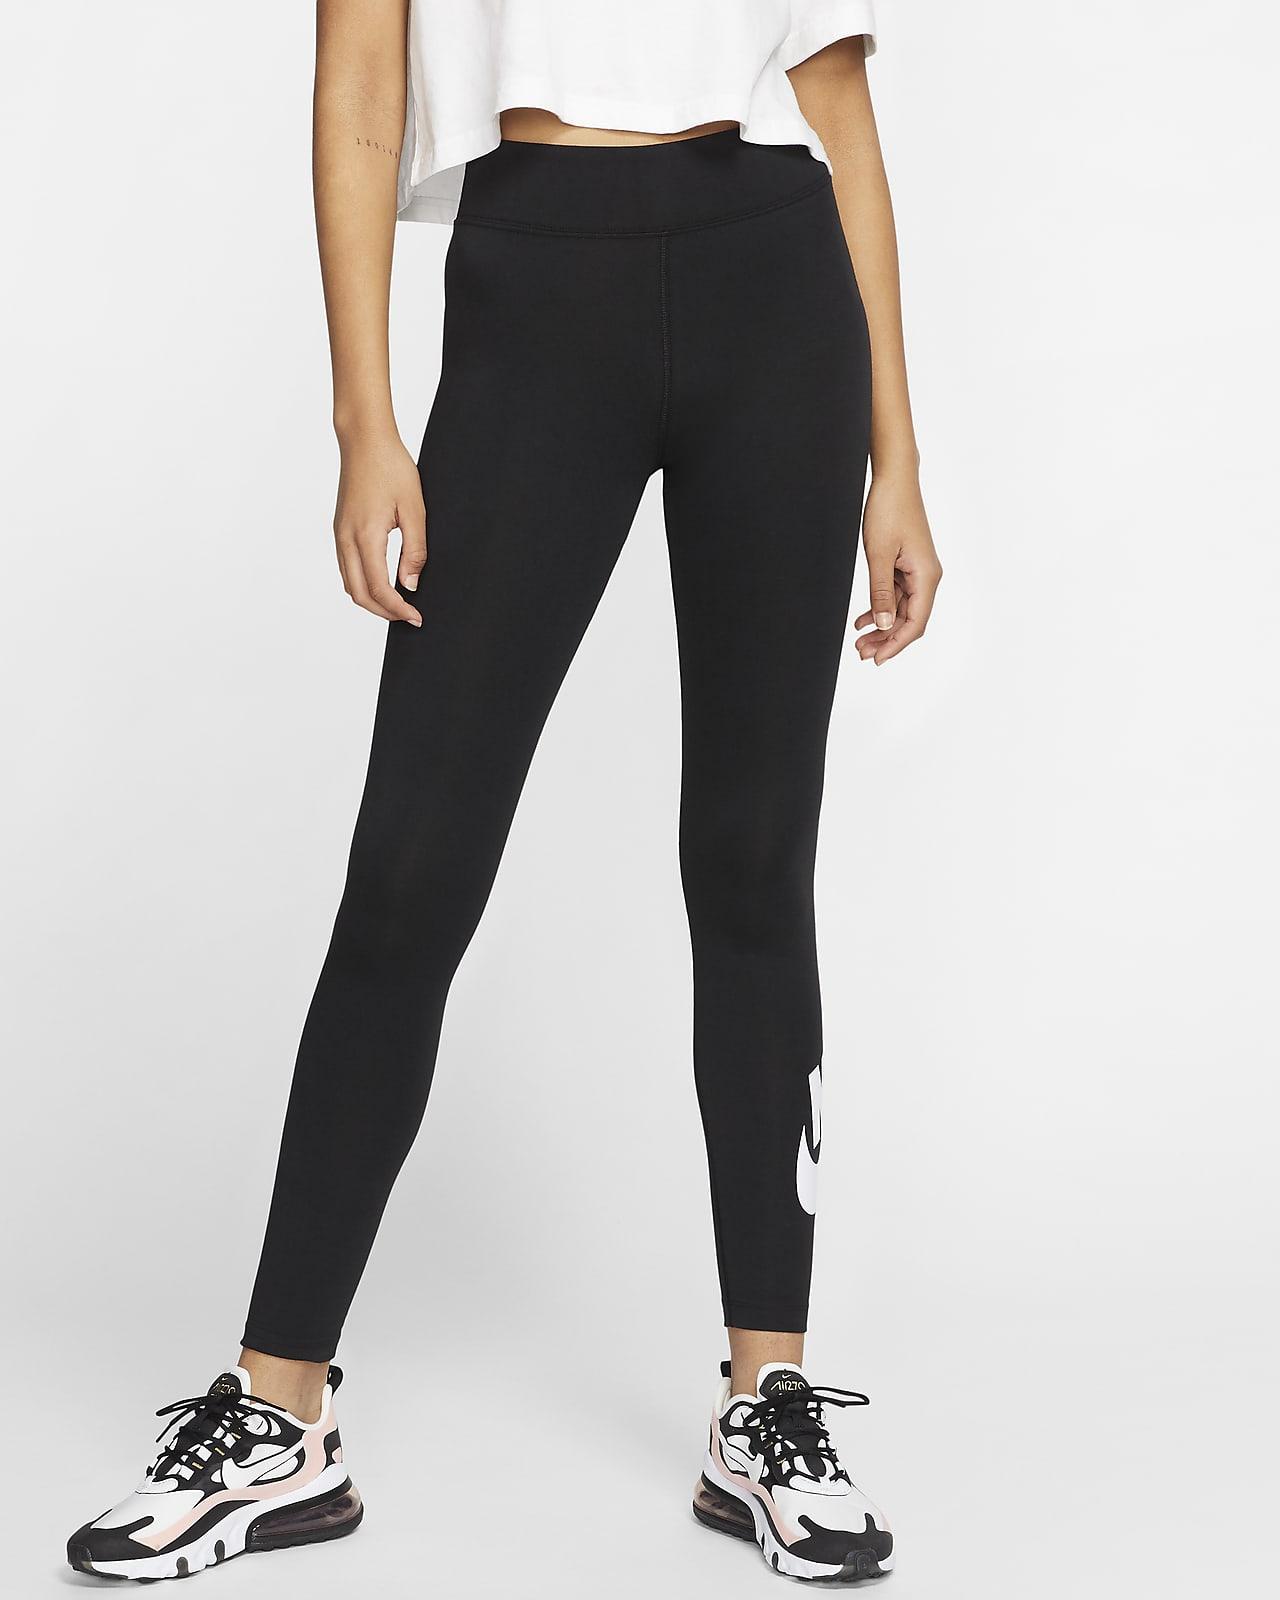 Nike Sportswear Damen-Leggings mit hohem Bund